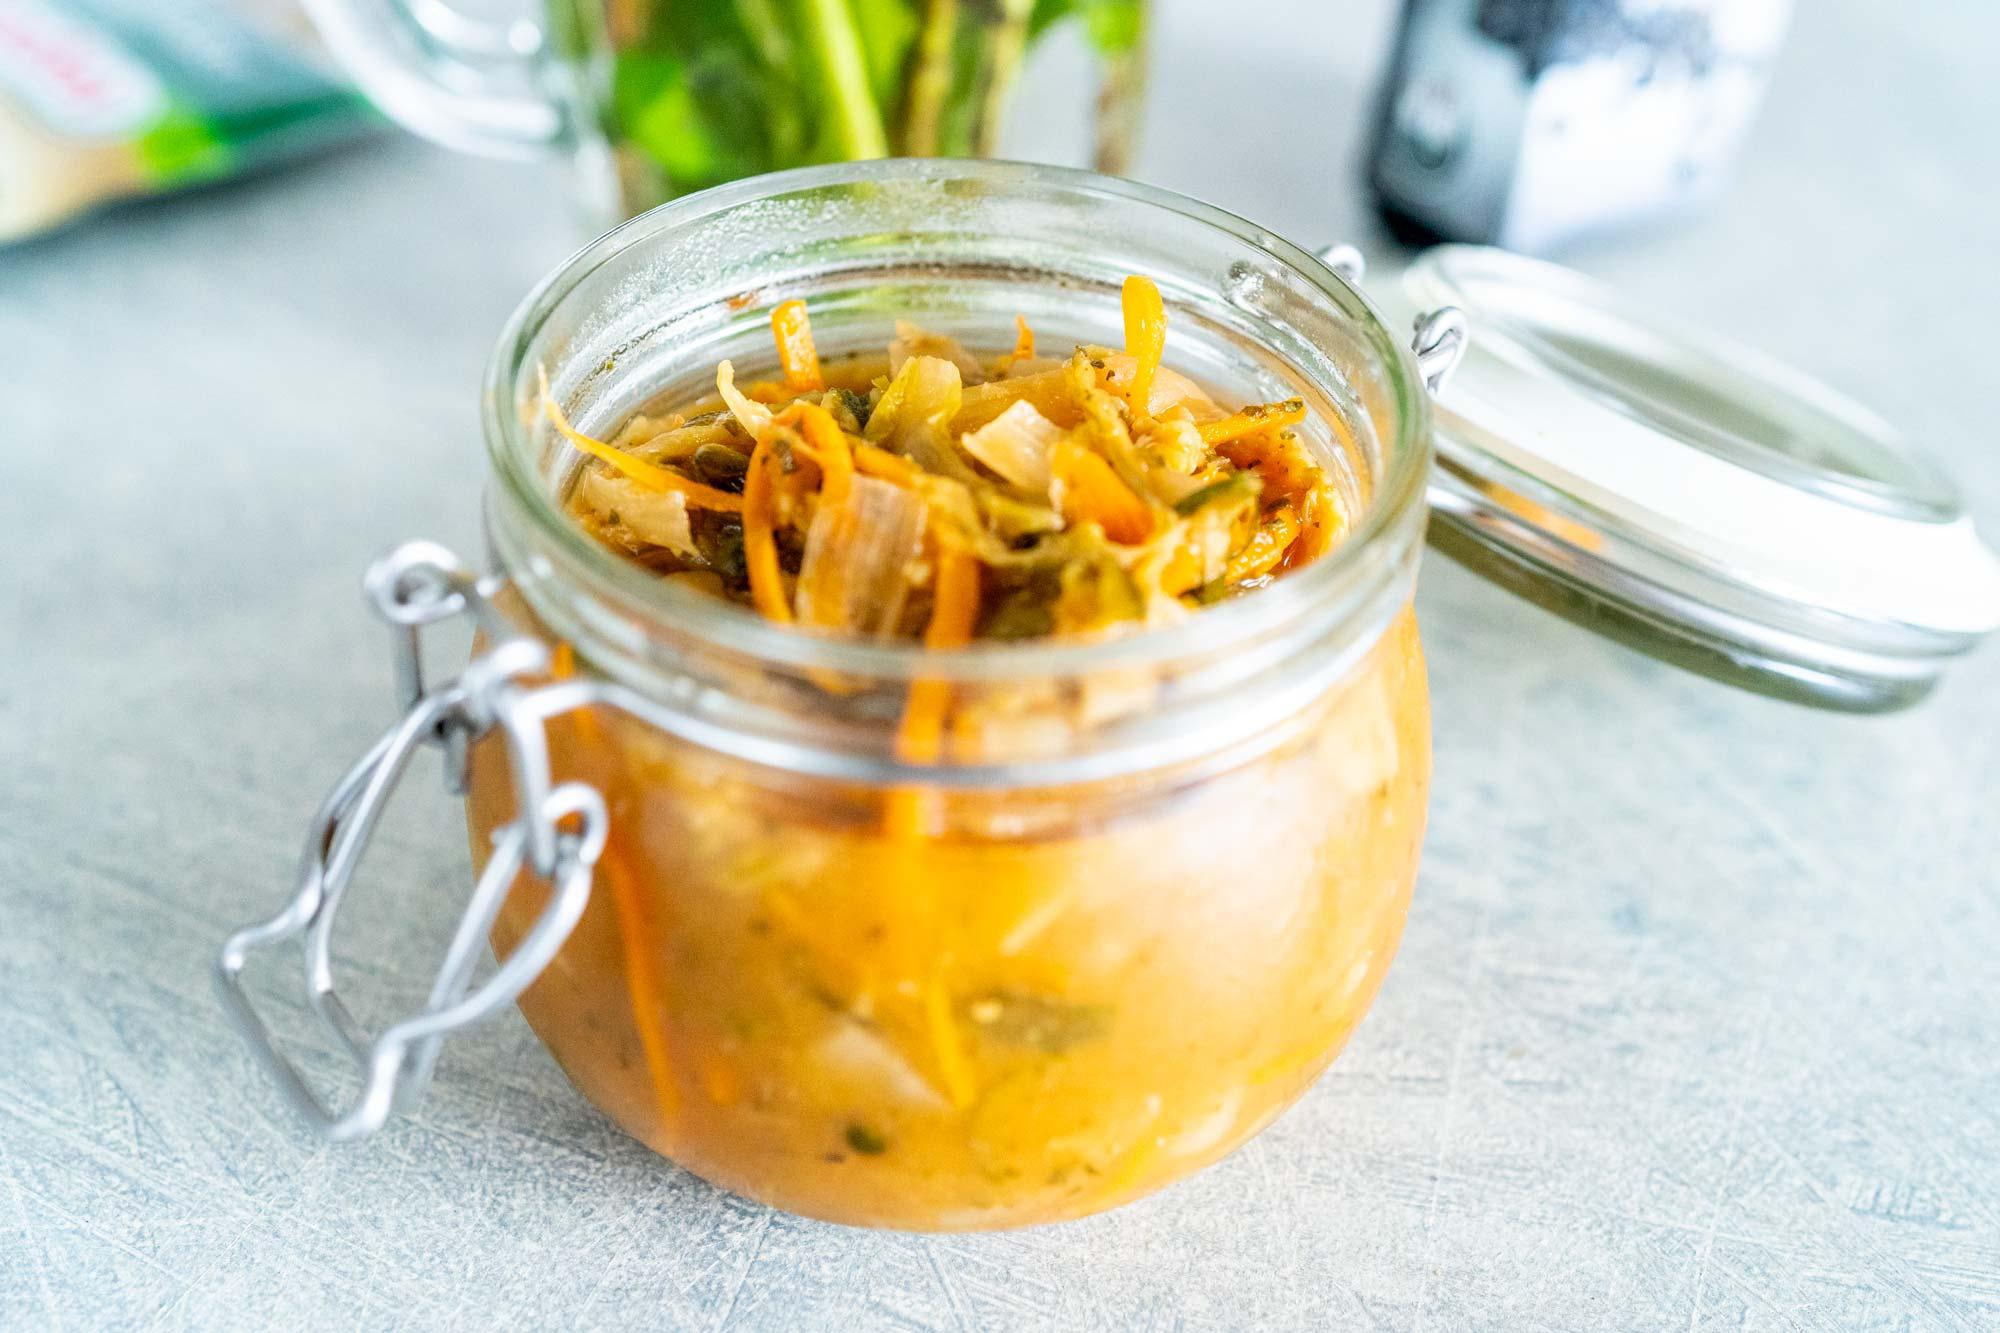 Kimči - fermentirana korejska zelenjava